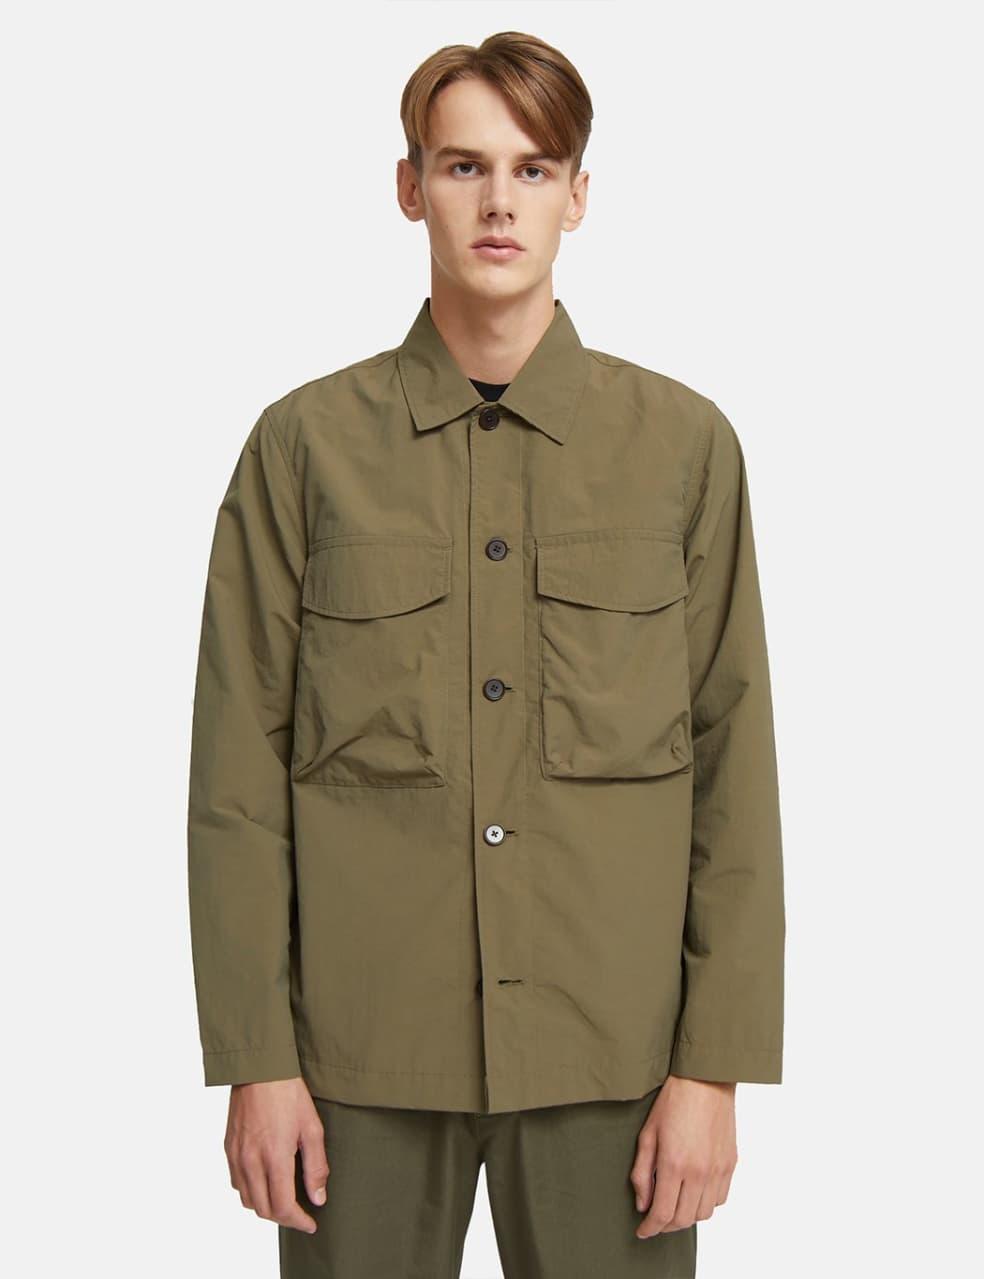 Wood Wood Fabian Tech Overshirt - Olive Green | Shirt by Wood Wood 1